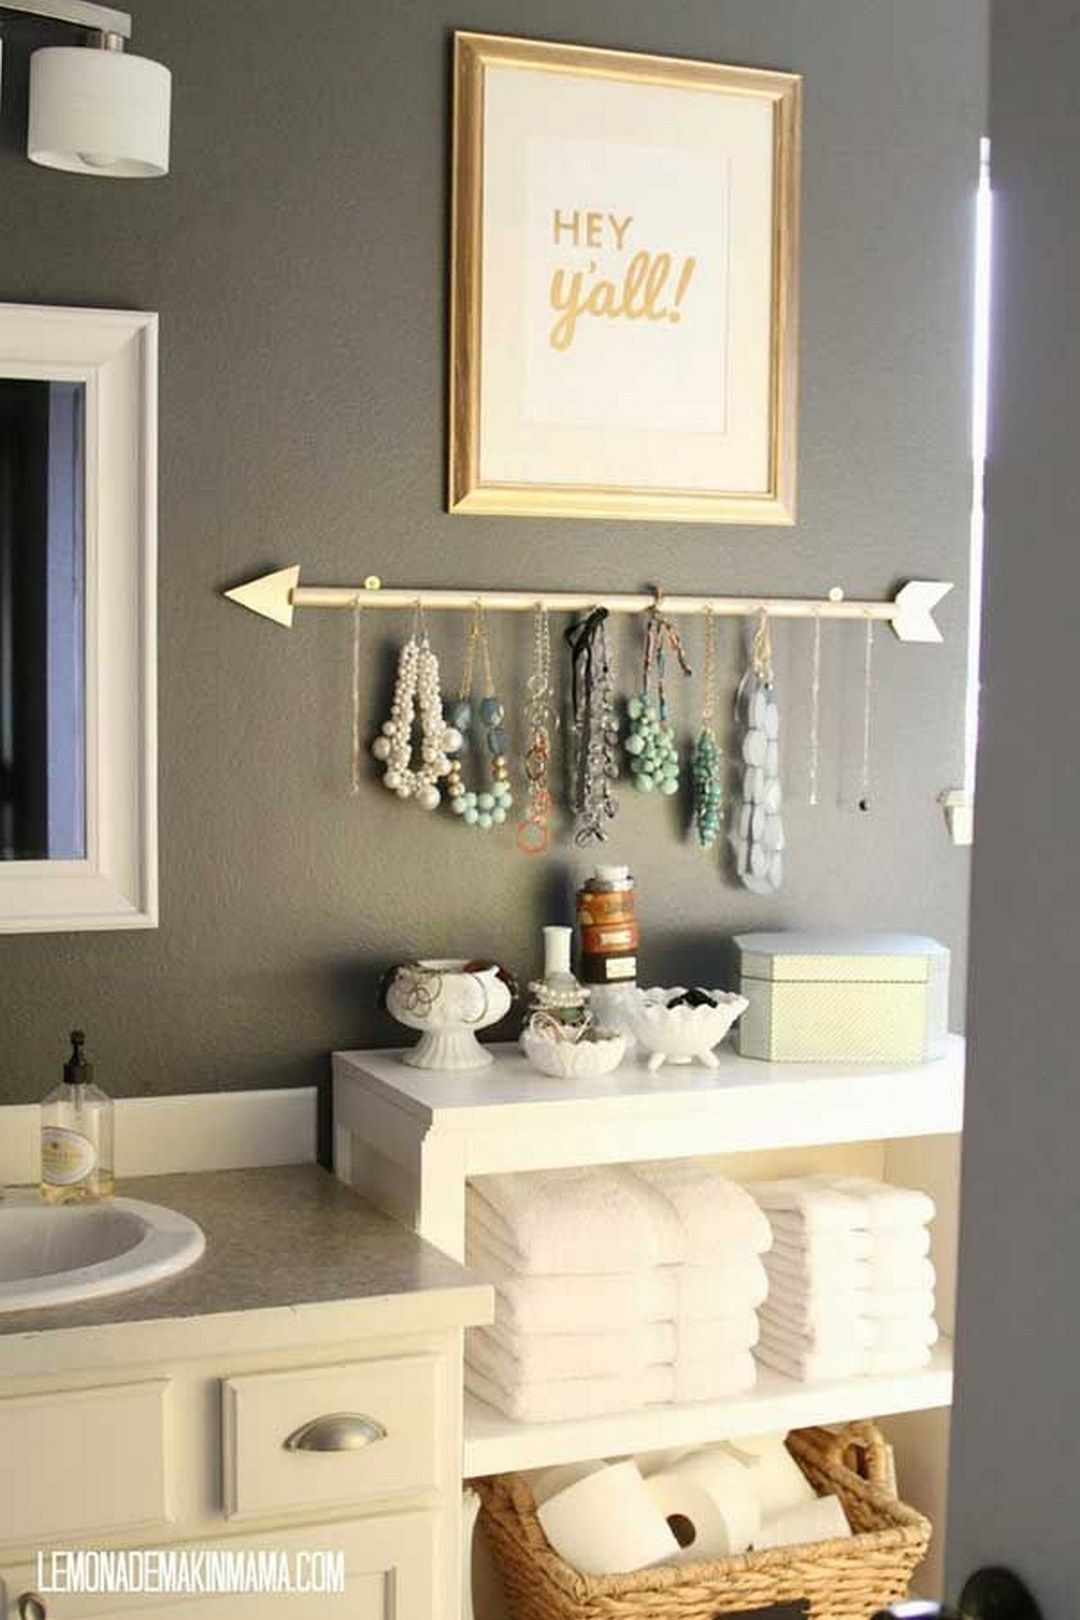 48+ Bathroom ideas small spaces budget ideas in 2021